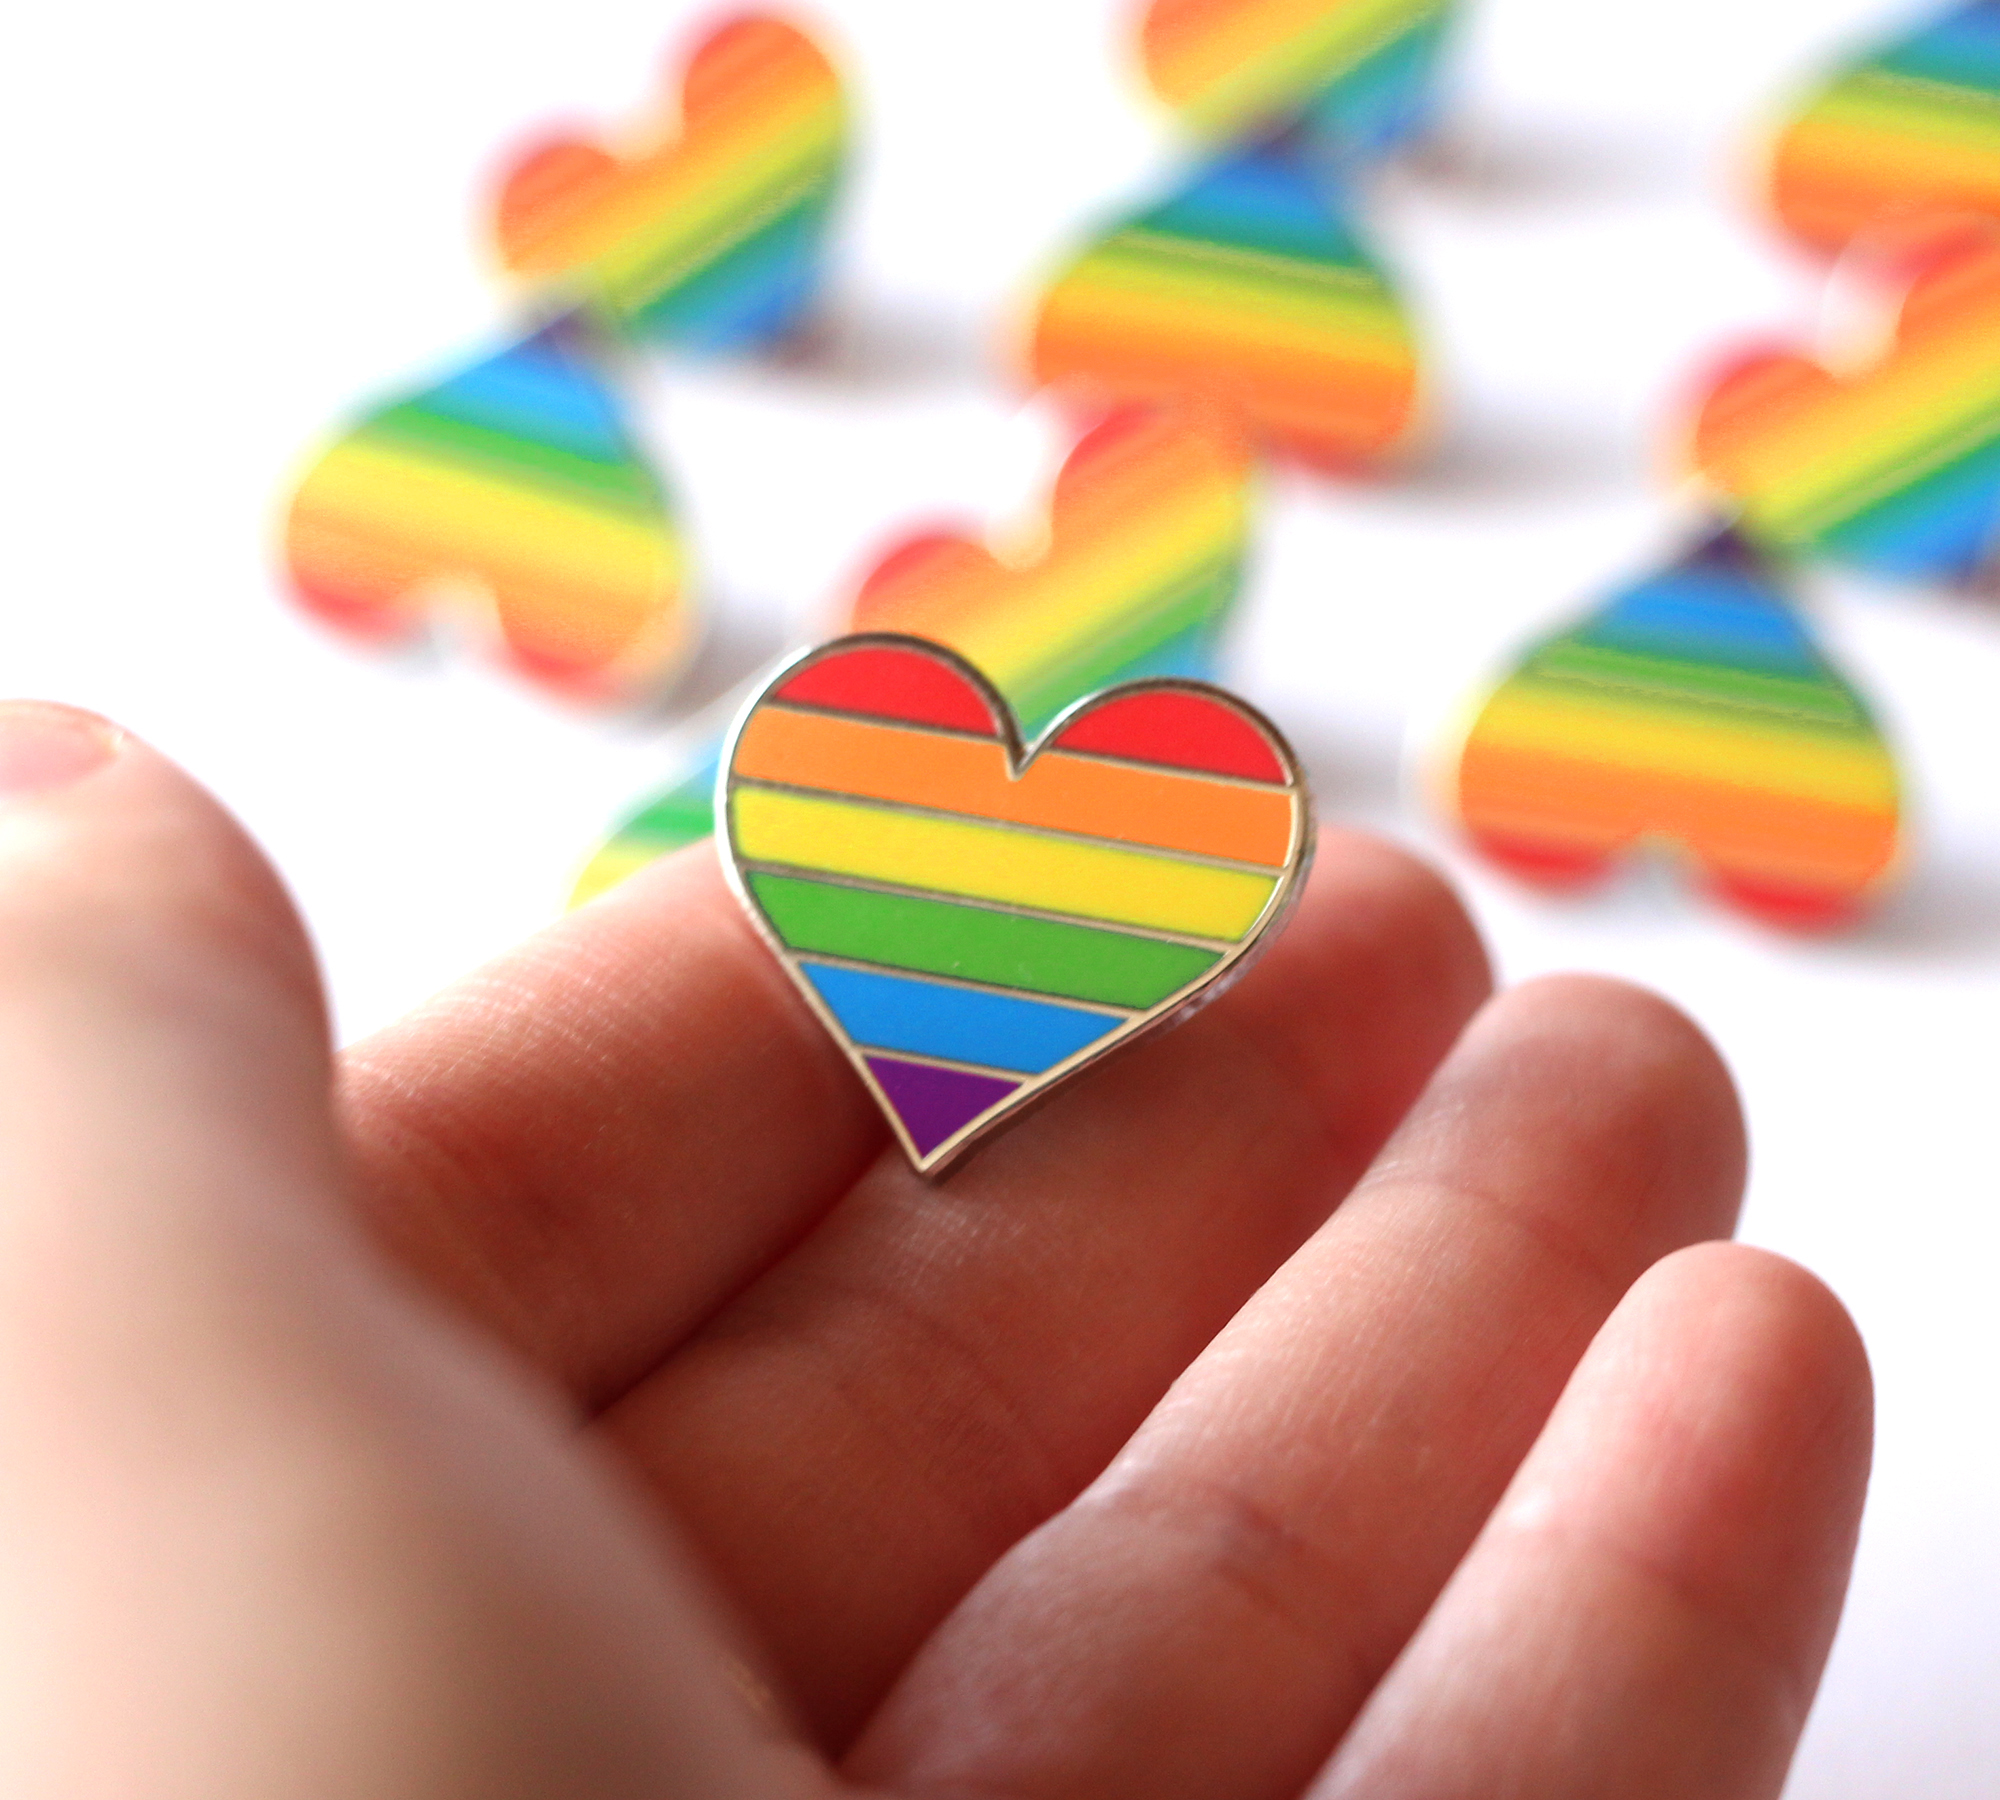 Rainbow Cake enamel pin - lapel pin - hat pin by MightyPop